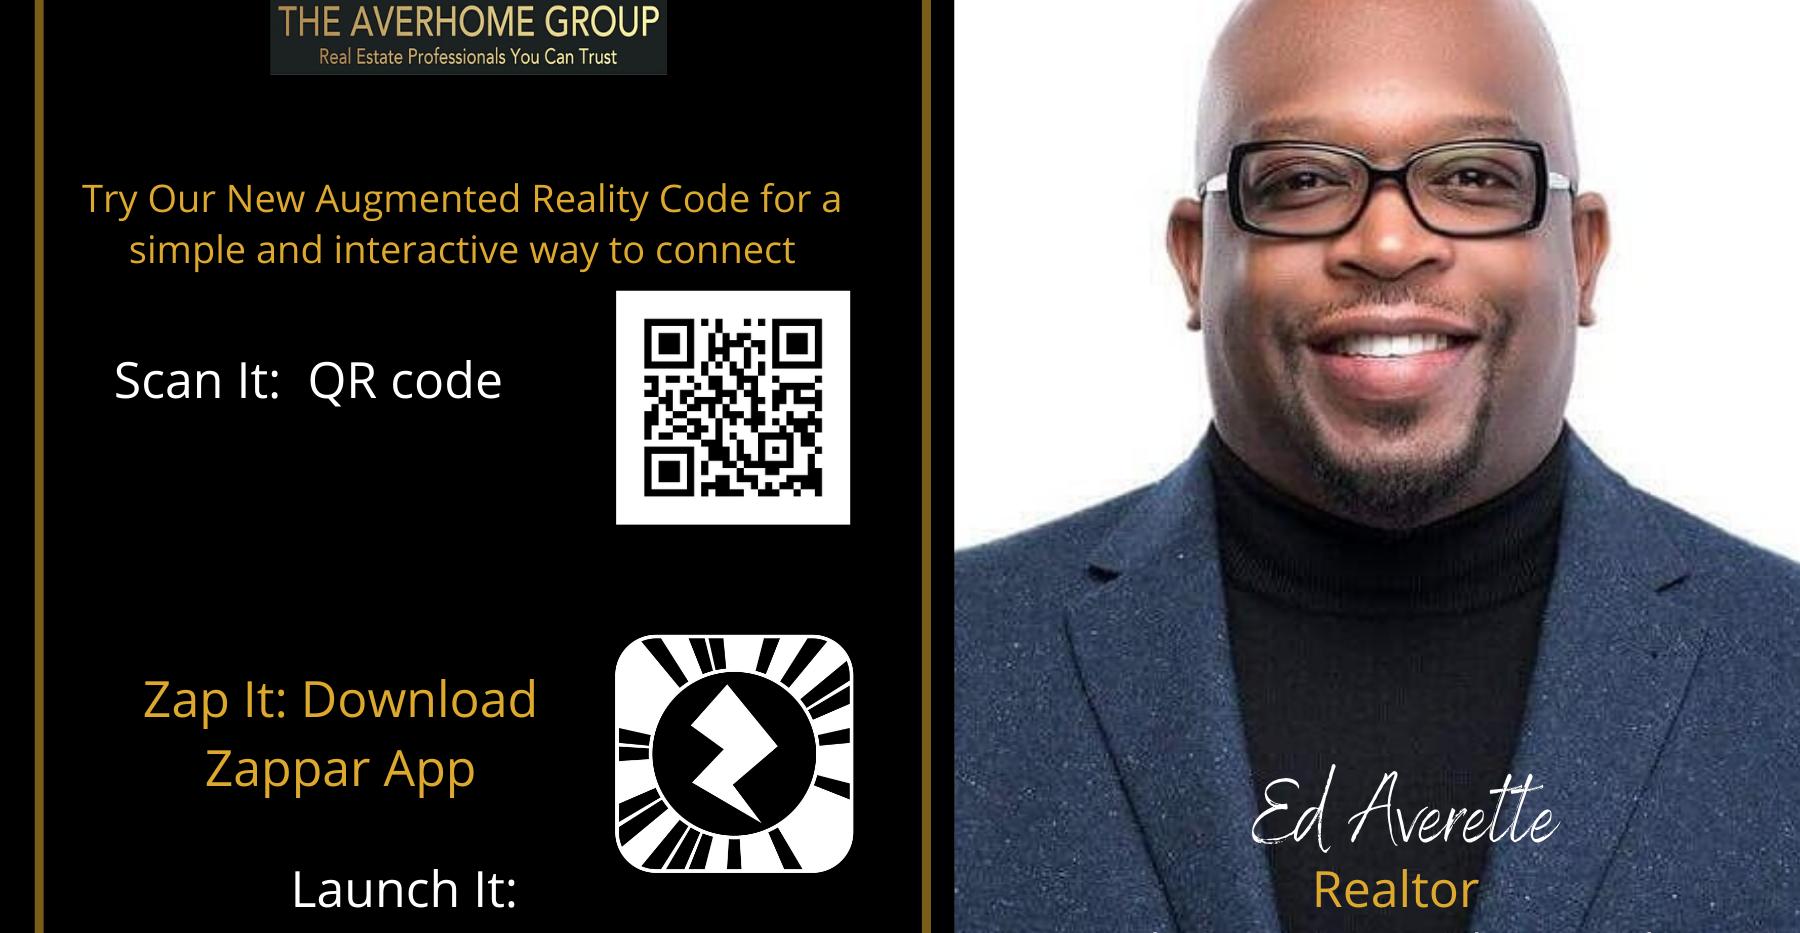 AverHome Group_Fathom Realty AR Business